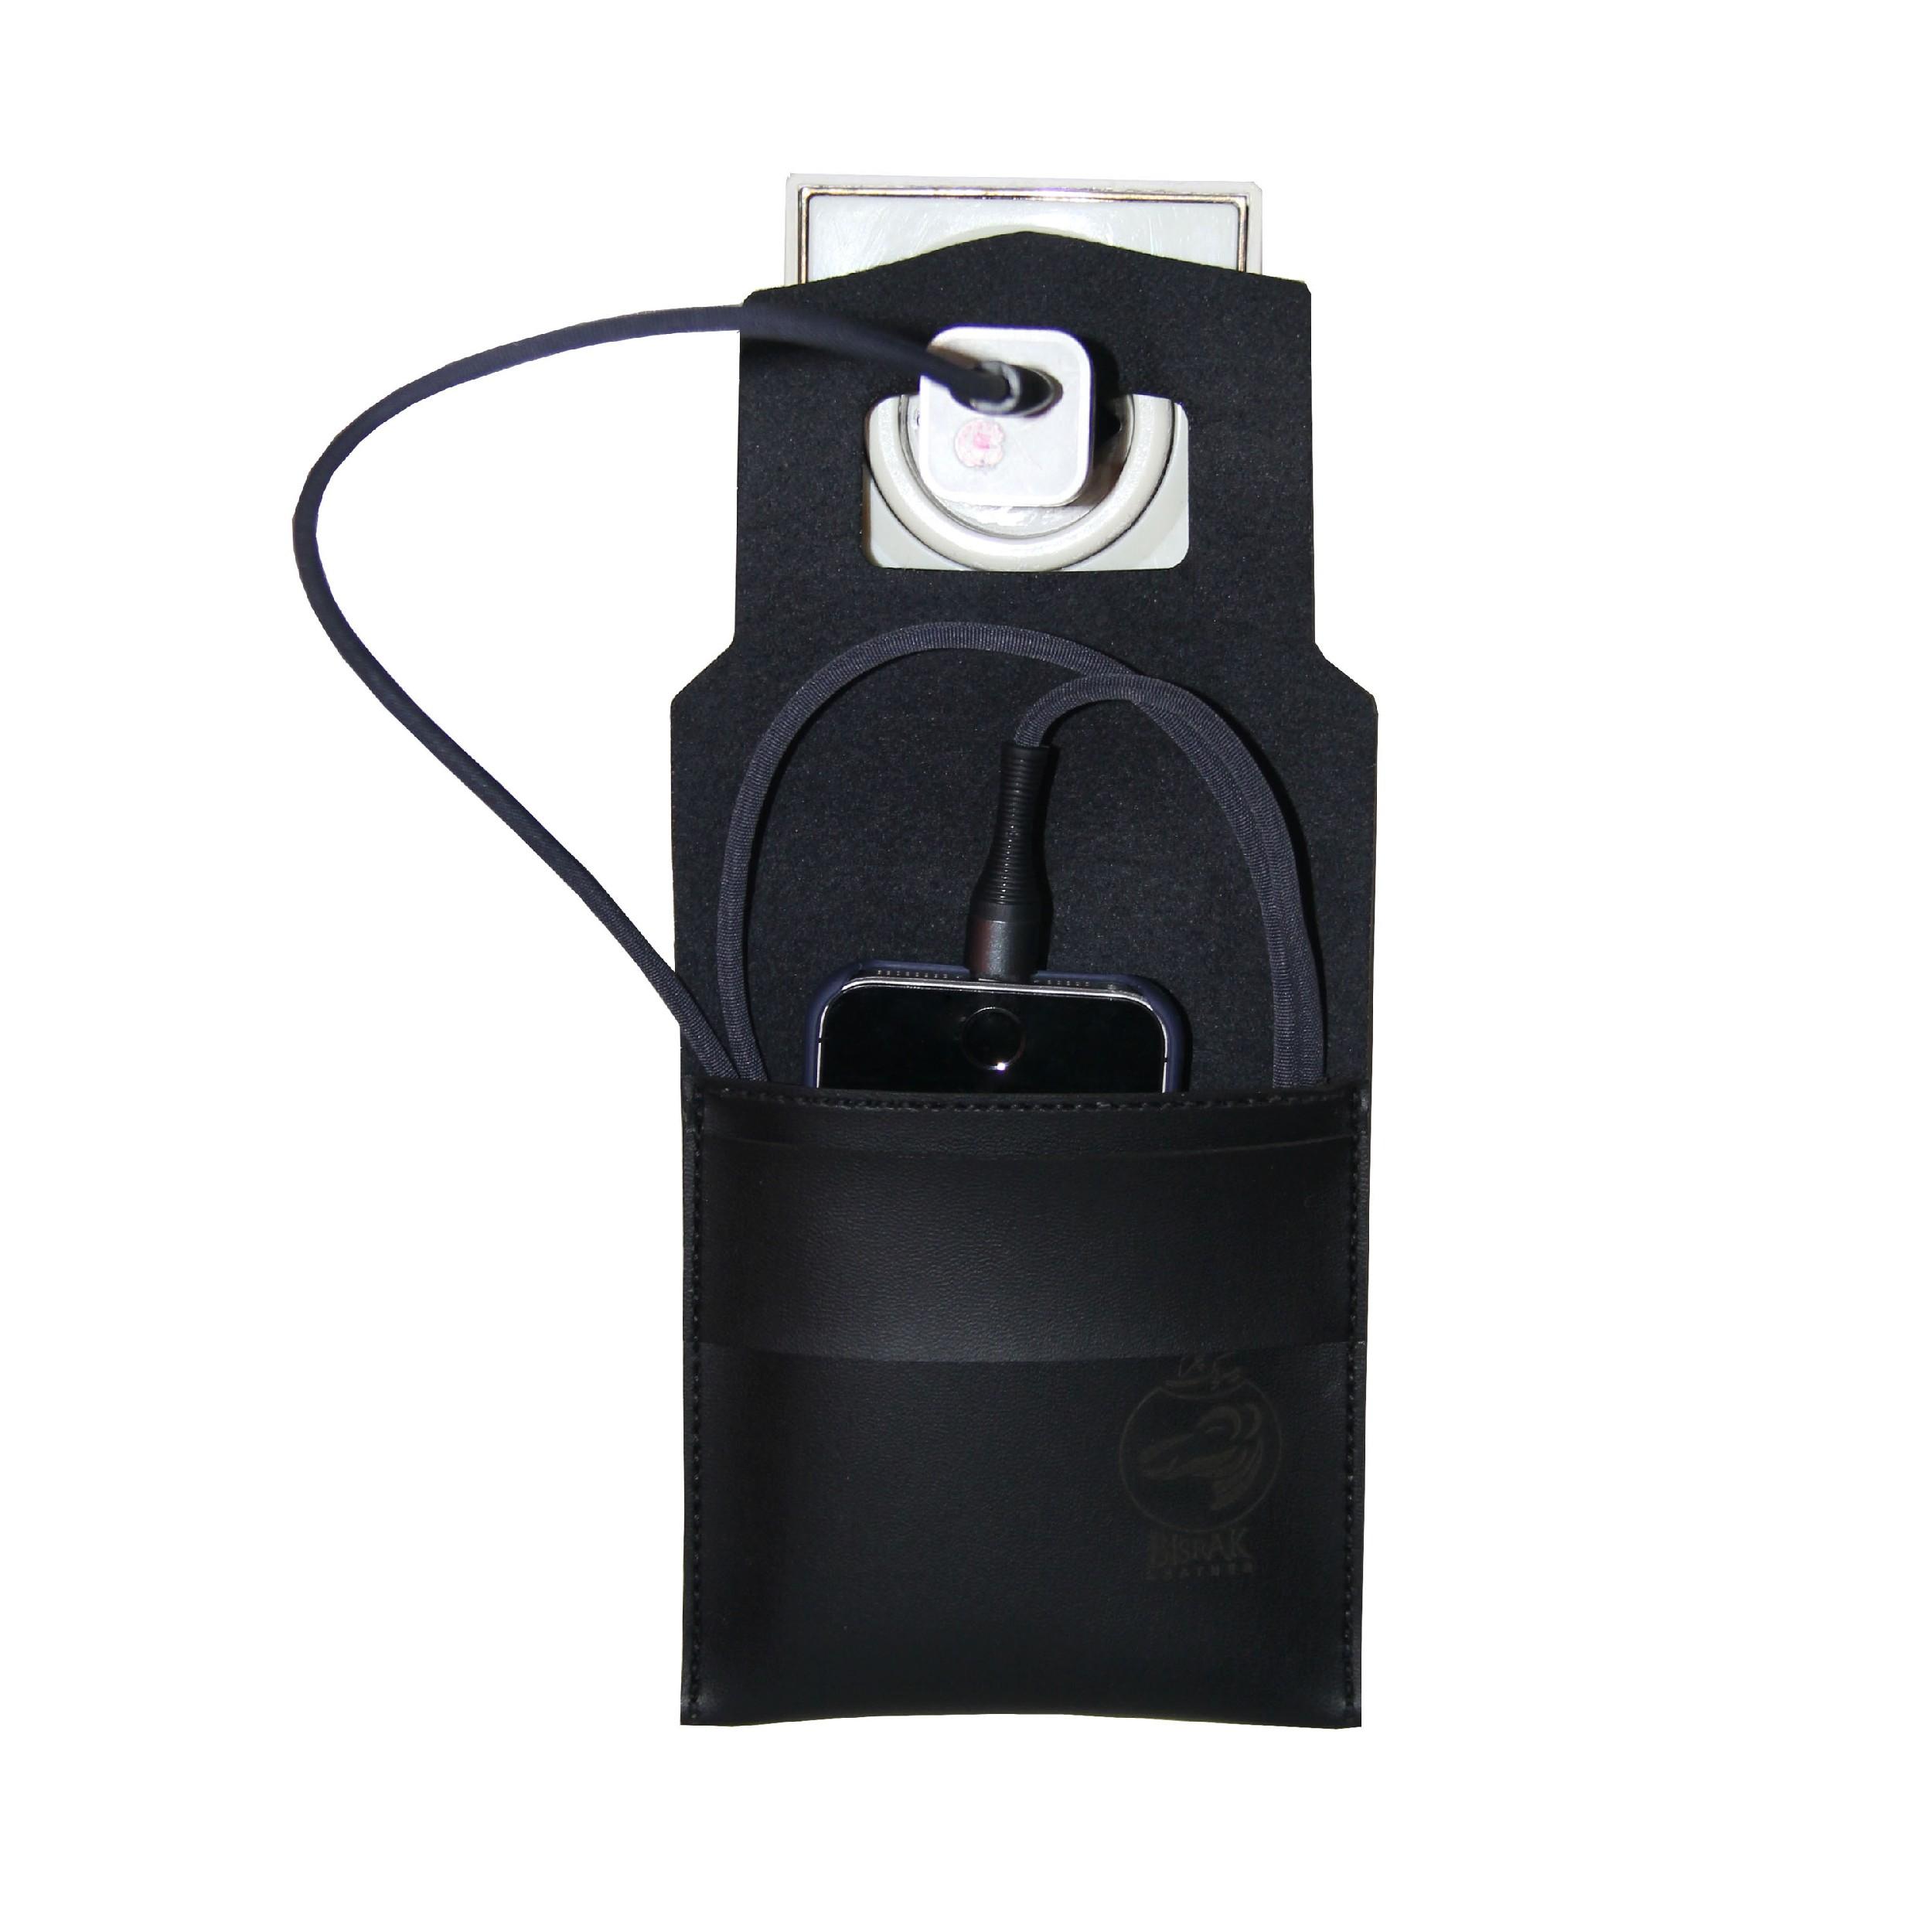 نگهدارنده گوشی موبایل چرم بیسراک کد N.Char-201